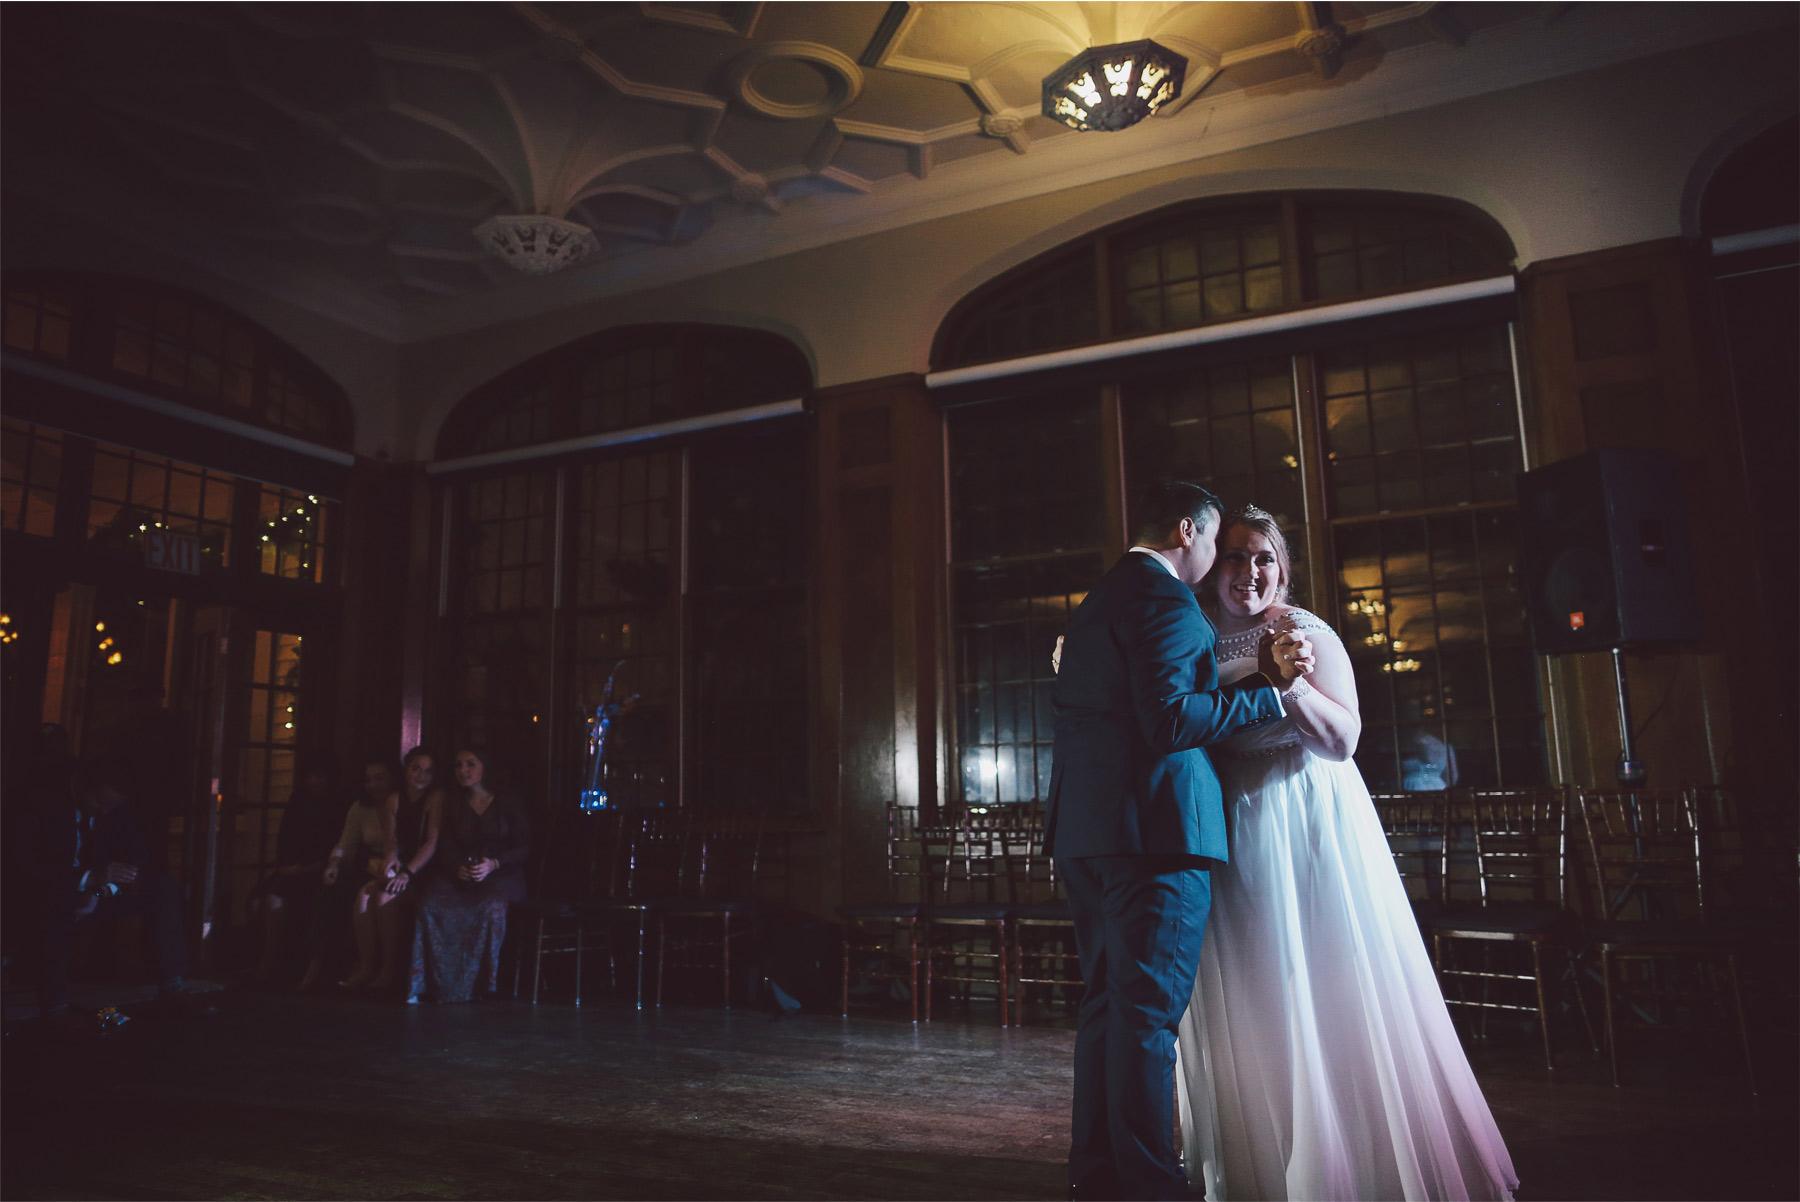 16-Saint-Paul-Minnesota-Wedding-Photography-by-Vick-Photography-The-University-Club-Reception-First-Dance-Mari-and-Giuseppe.jpg